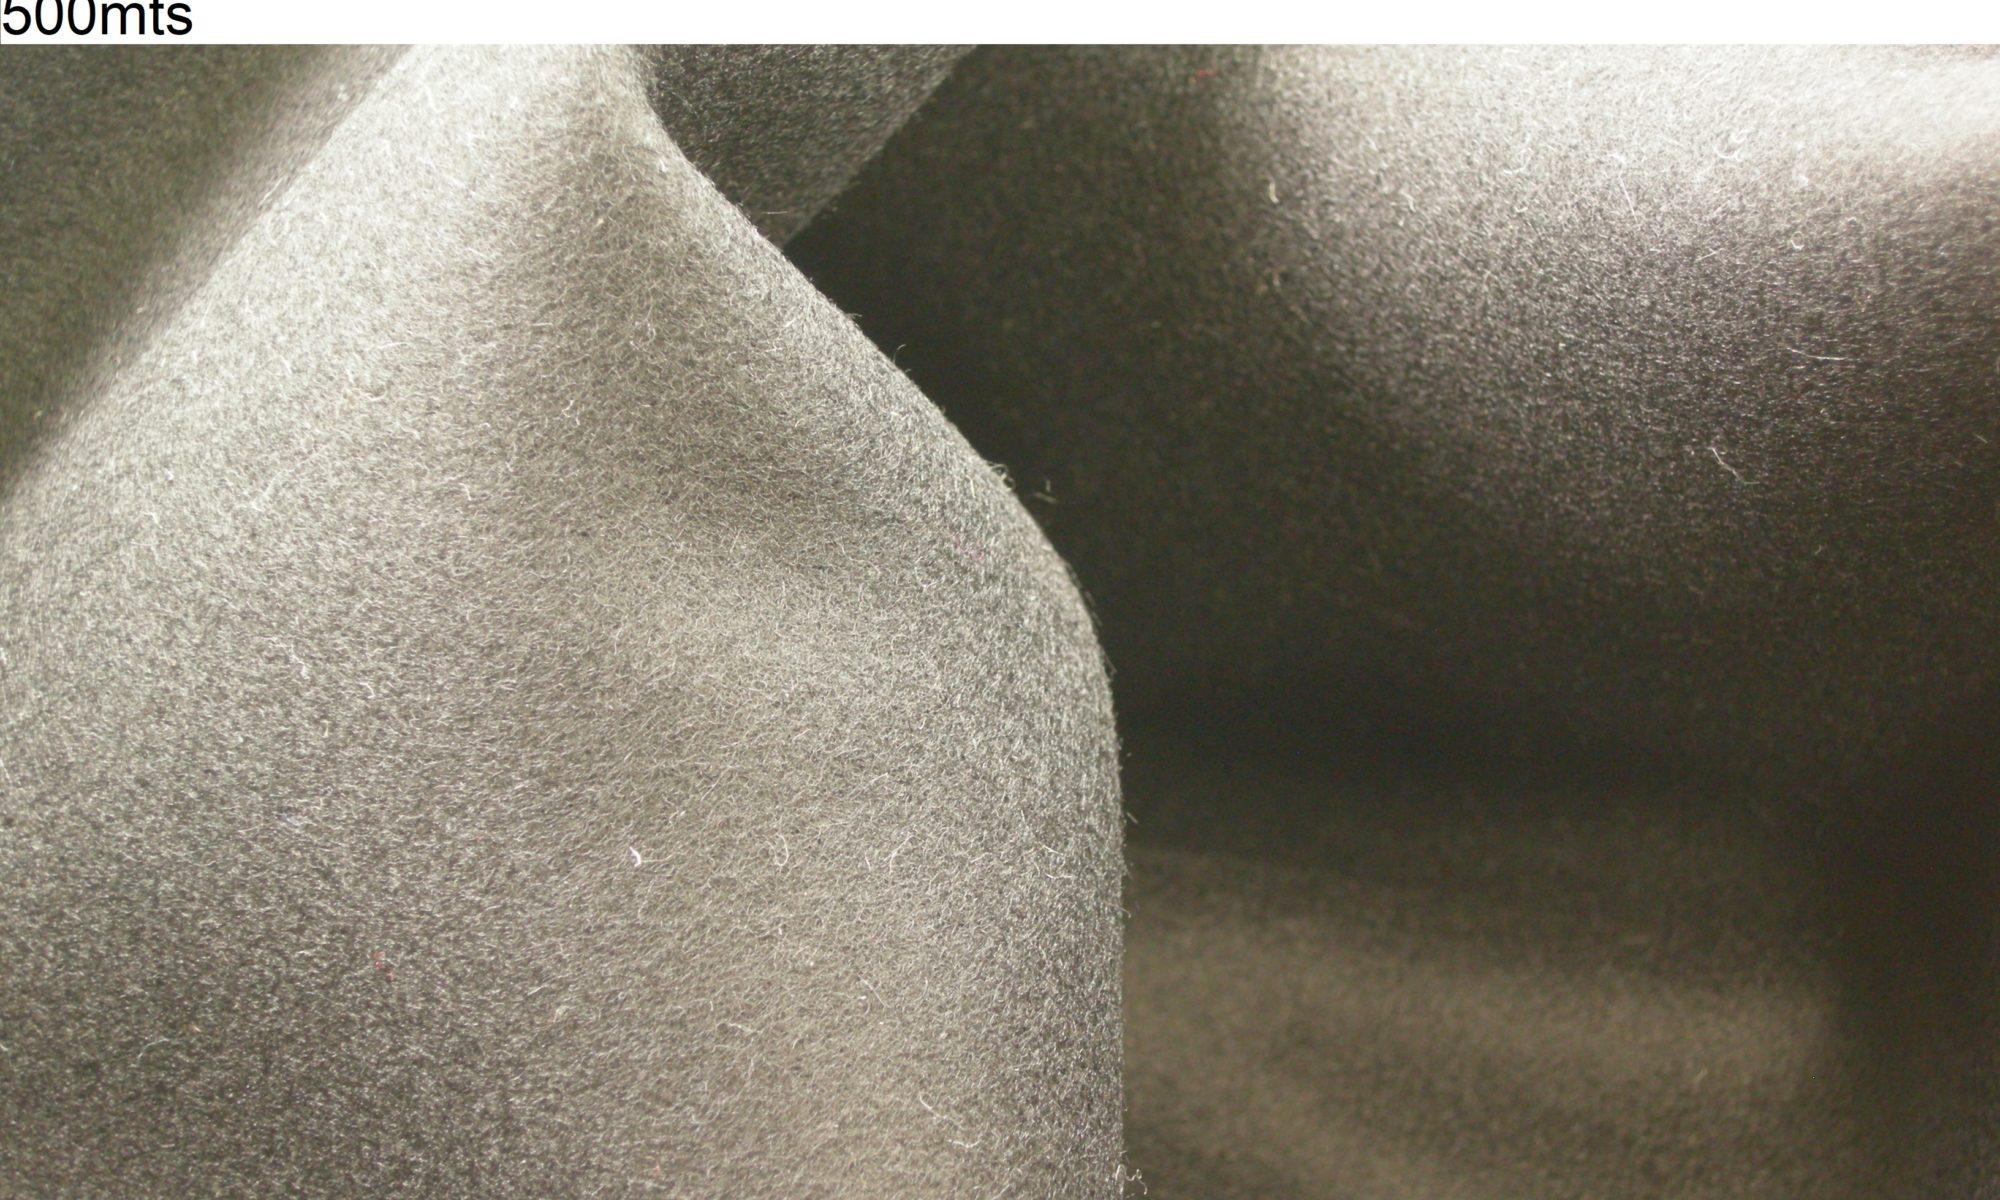 ART 7179 Felt cashmere blend thin coat fabric WIDTH cm150 WEIGHT gr570 COMPOSITION 75Virgin wool 20 Nylon polyammide 5 cashmere - 500mts